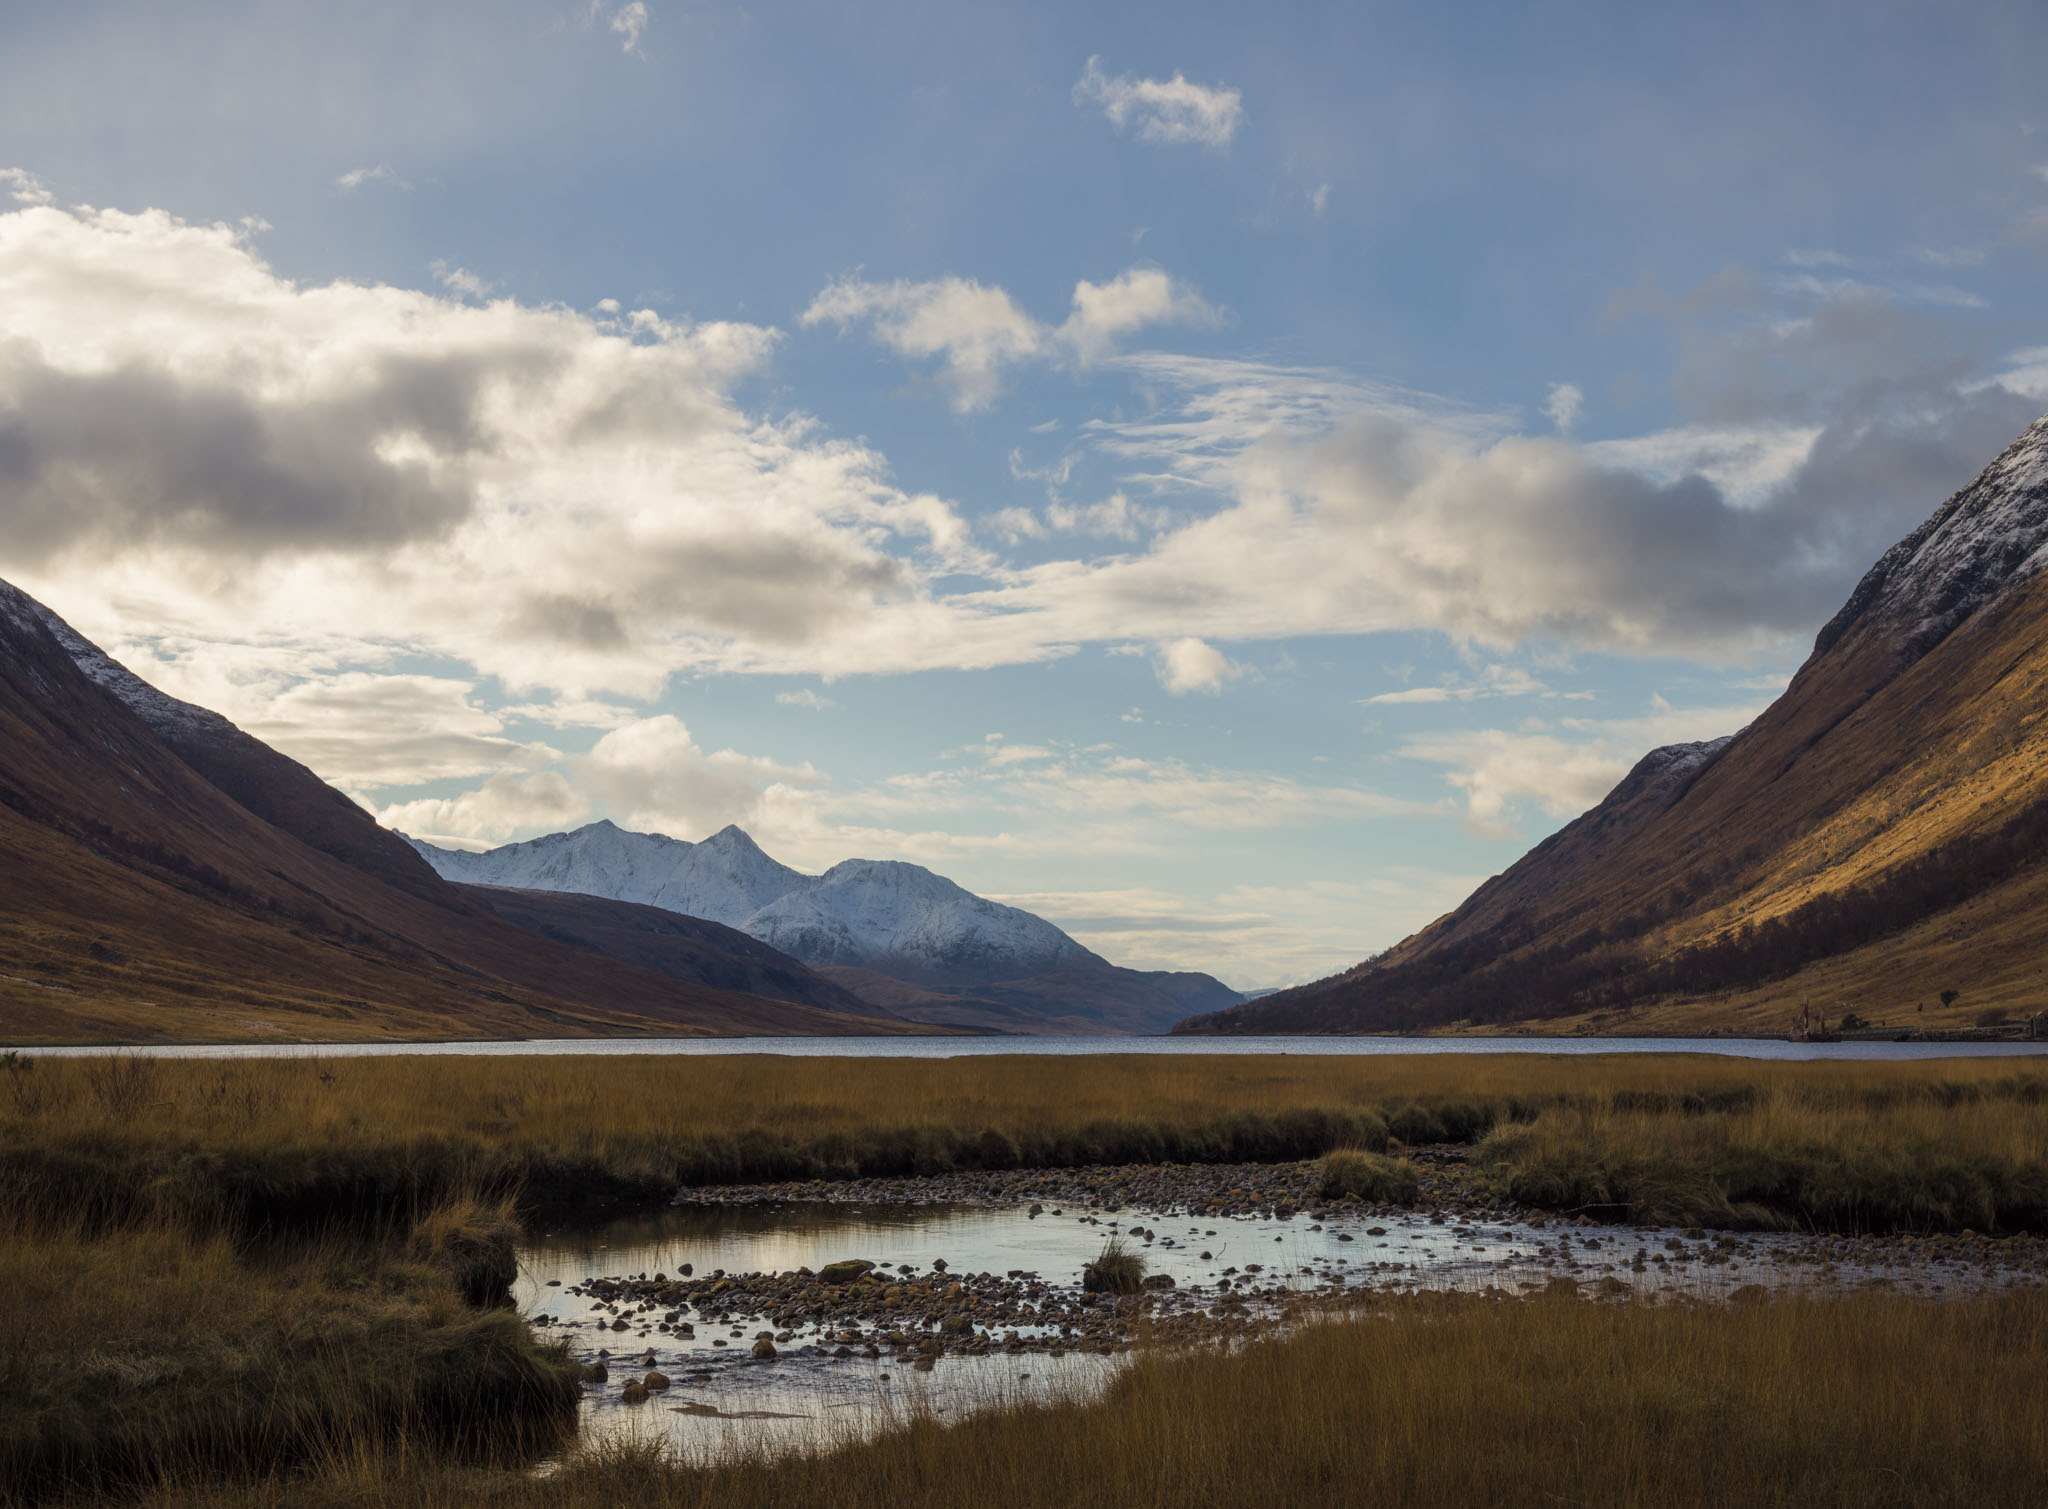 view of the Scottish Highlands near Glencoe